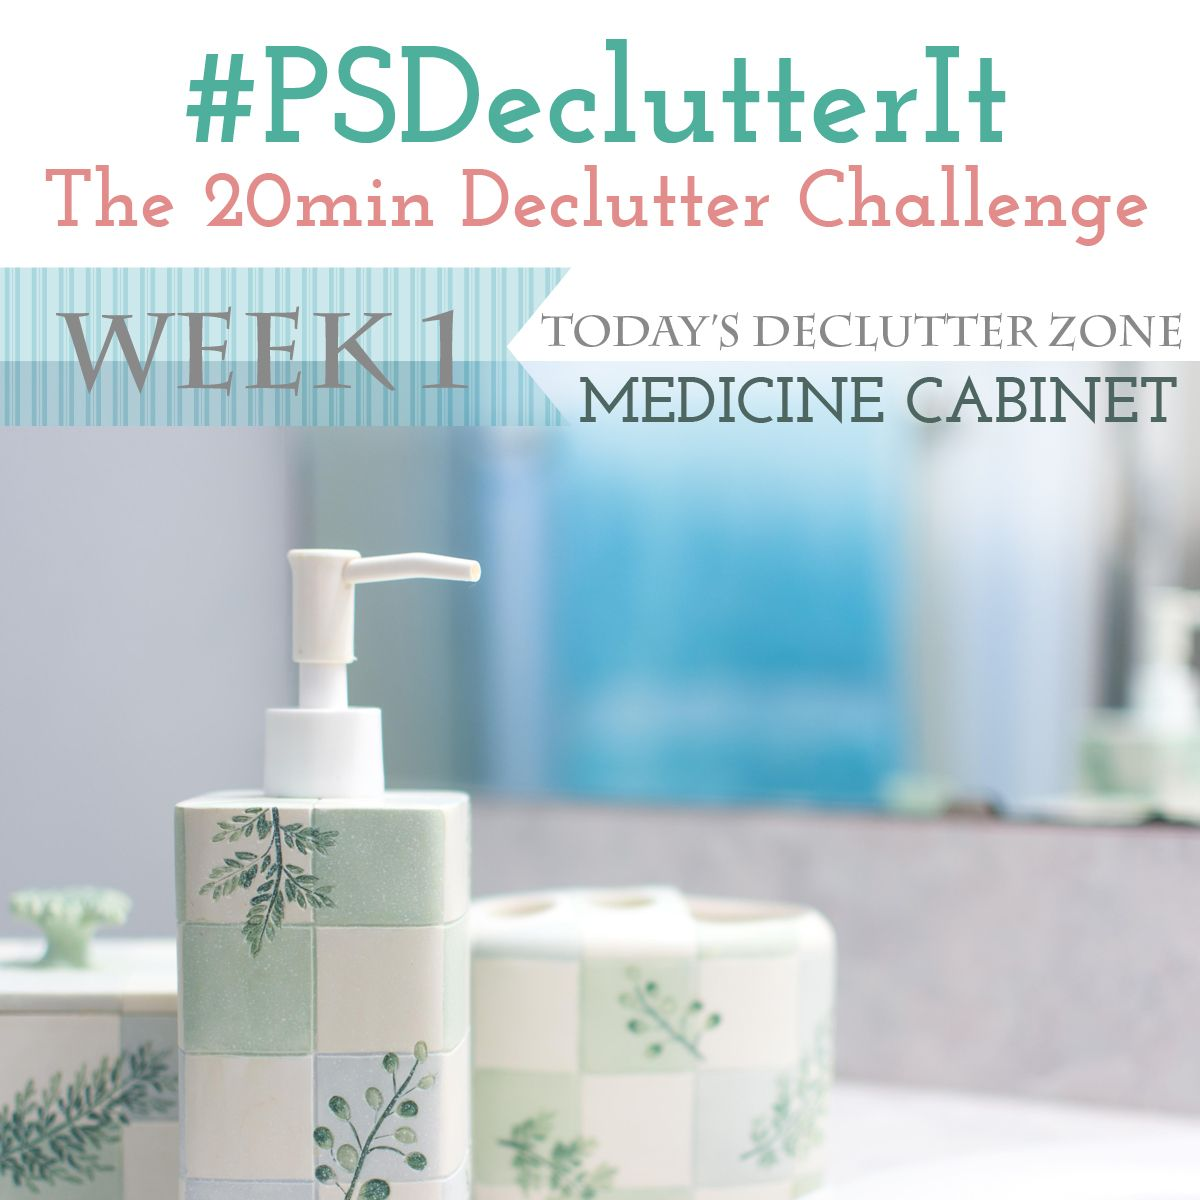 PSDeclutterIt Challenge Day 3 Declutter your Medicine Cabinet! Let's Get Organized!